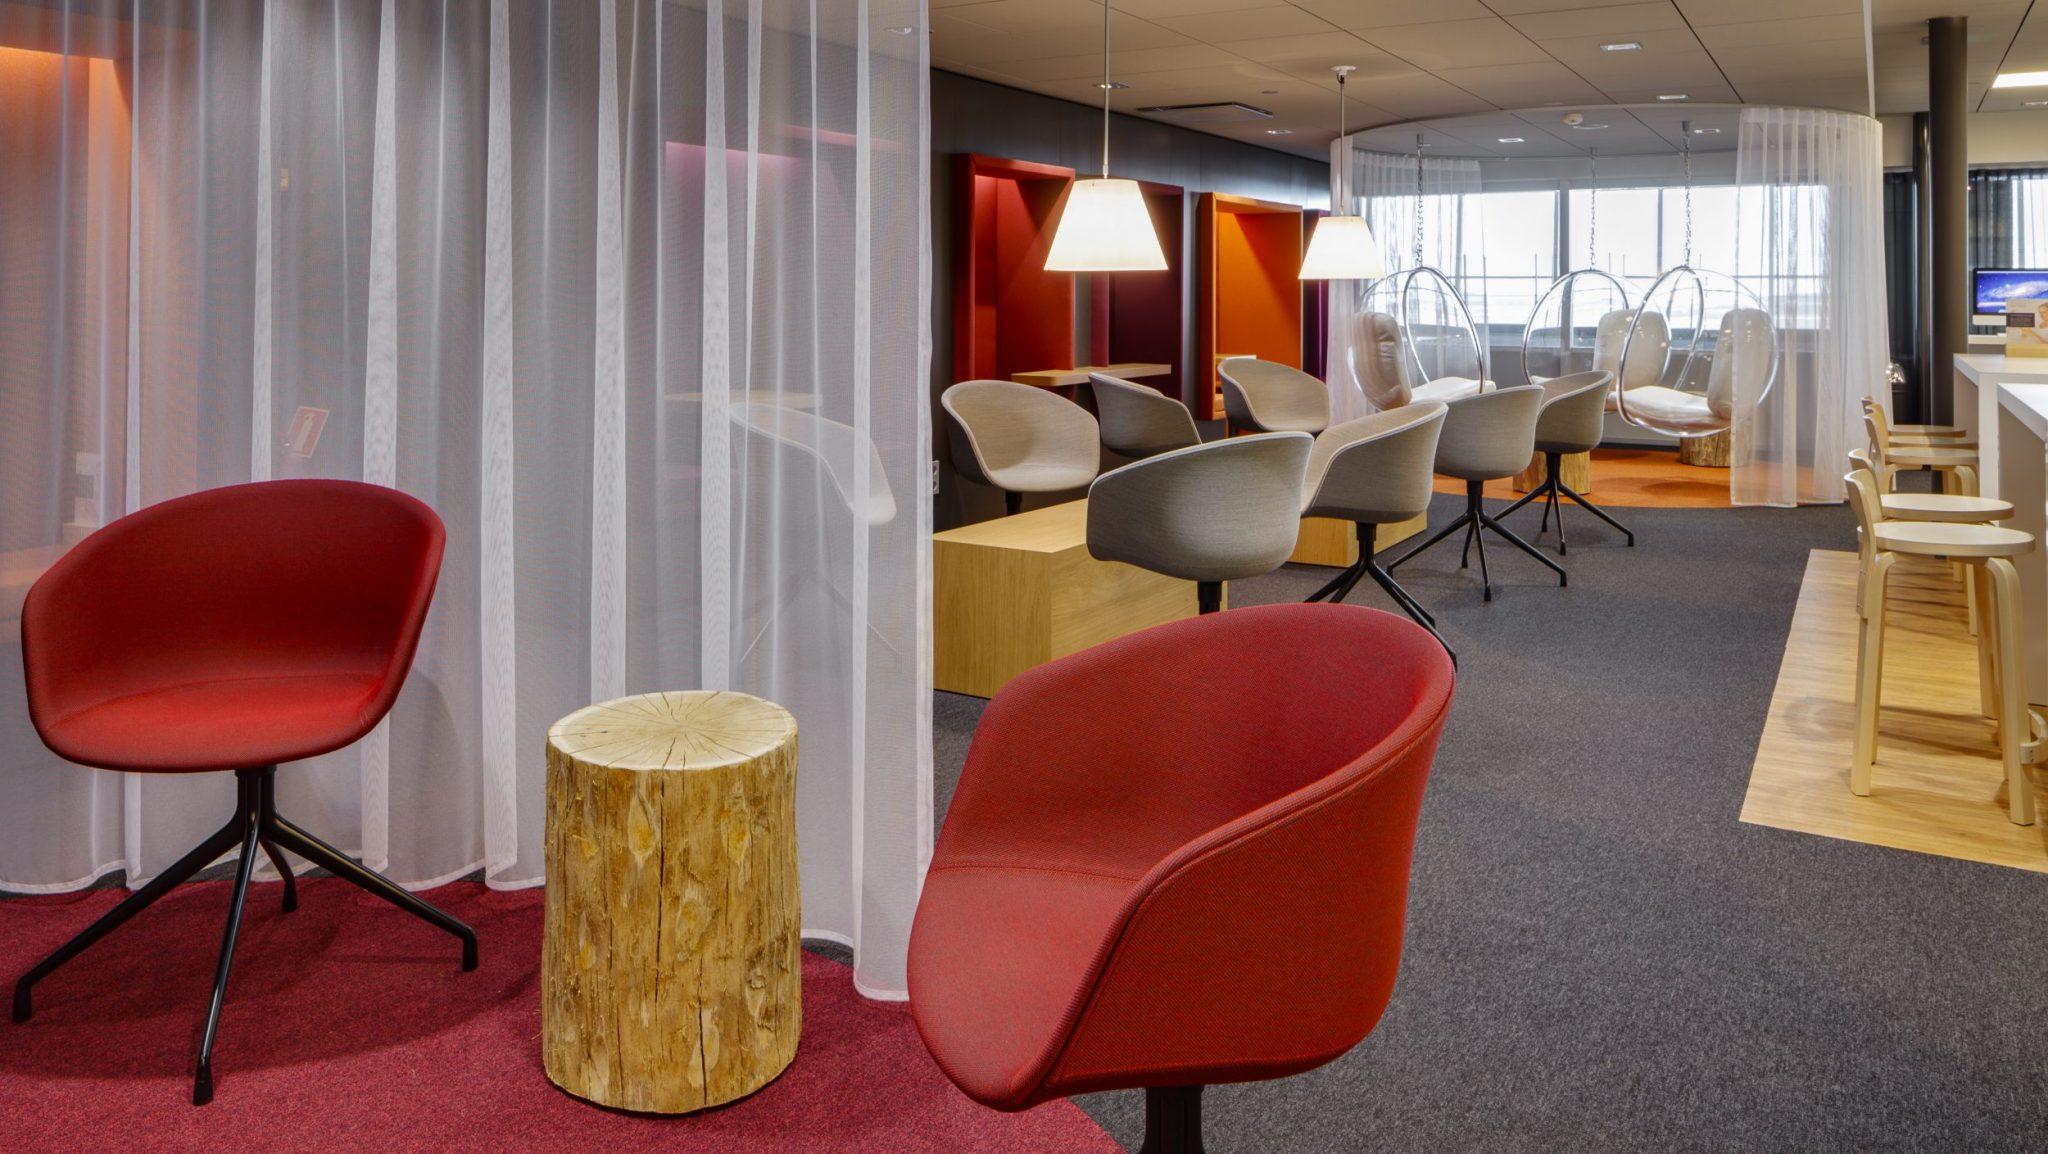 Servisair-Aspire-Airport-Lounge-Helsinki-Vantaa-GI-Project-3